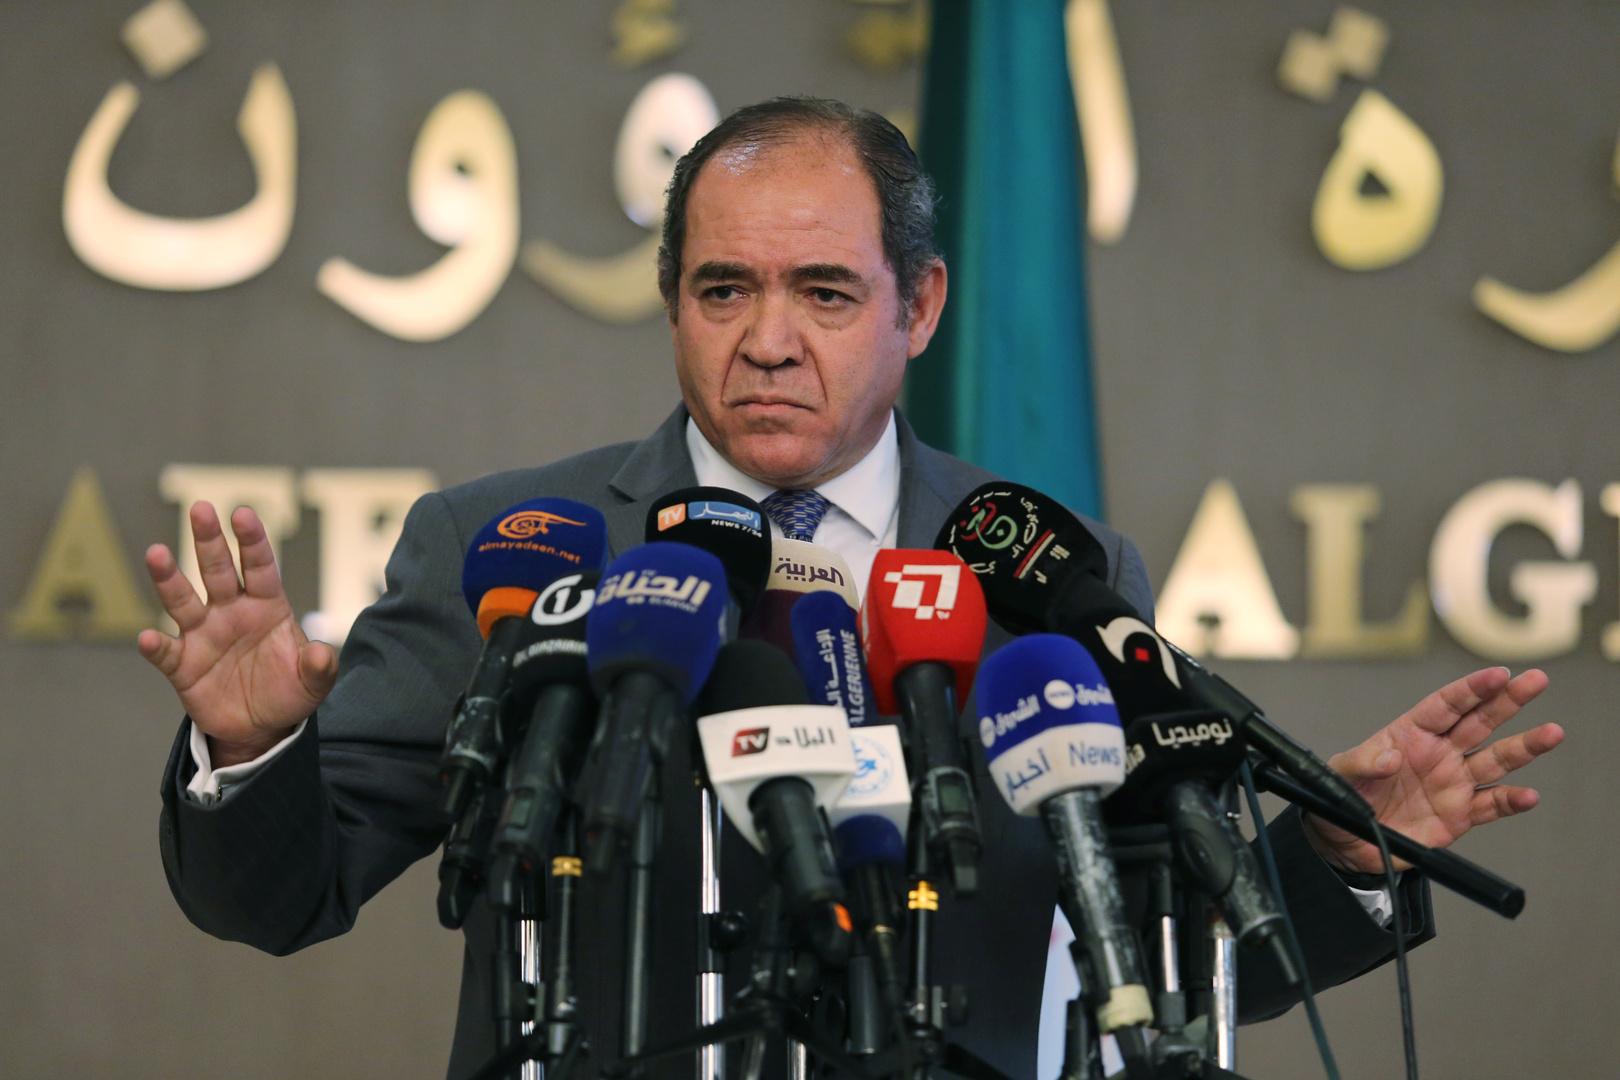 وزير خارجية الجزائر يزور روسيا